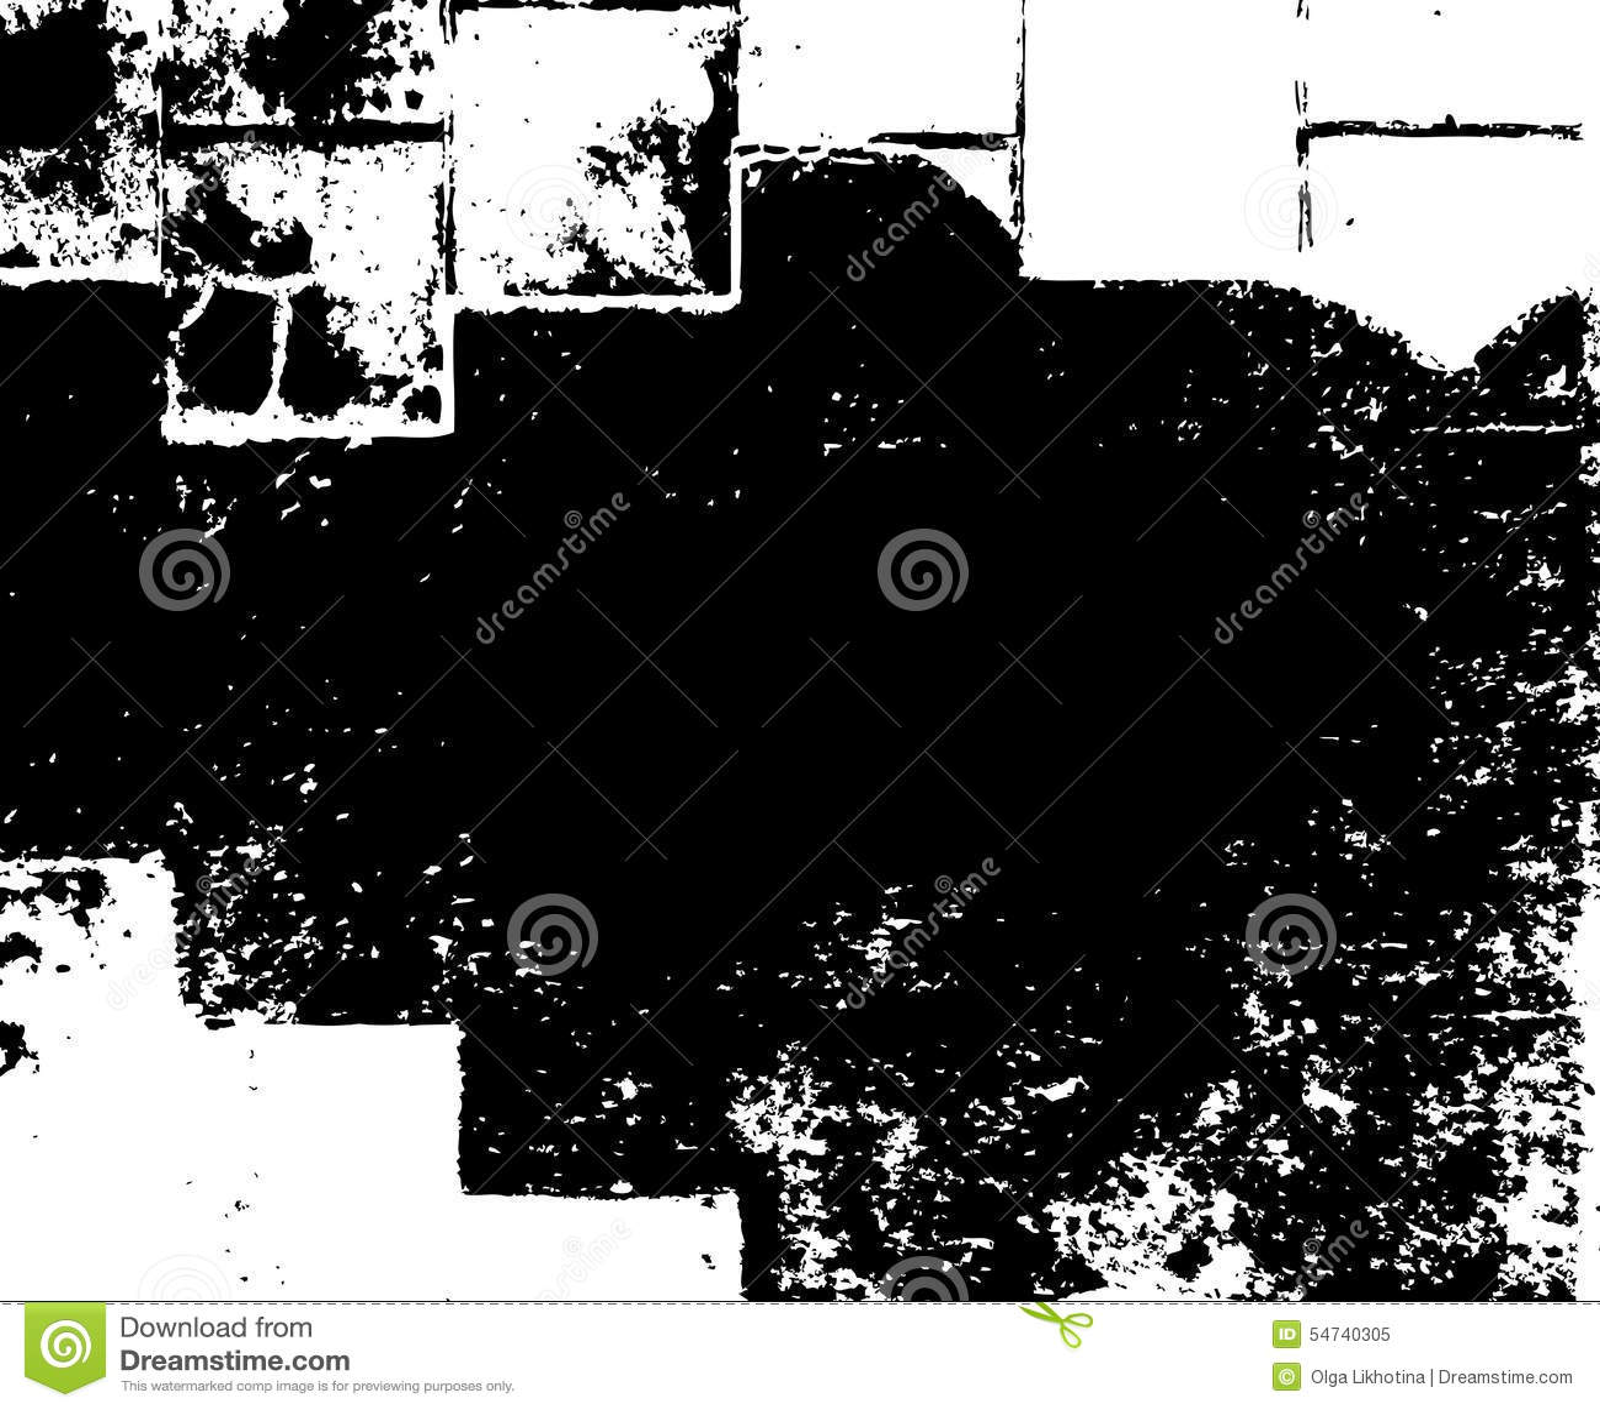 Vector of Sketch Grunge Dirt Overlay Texture